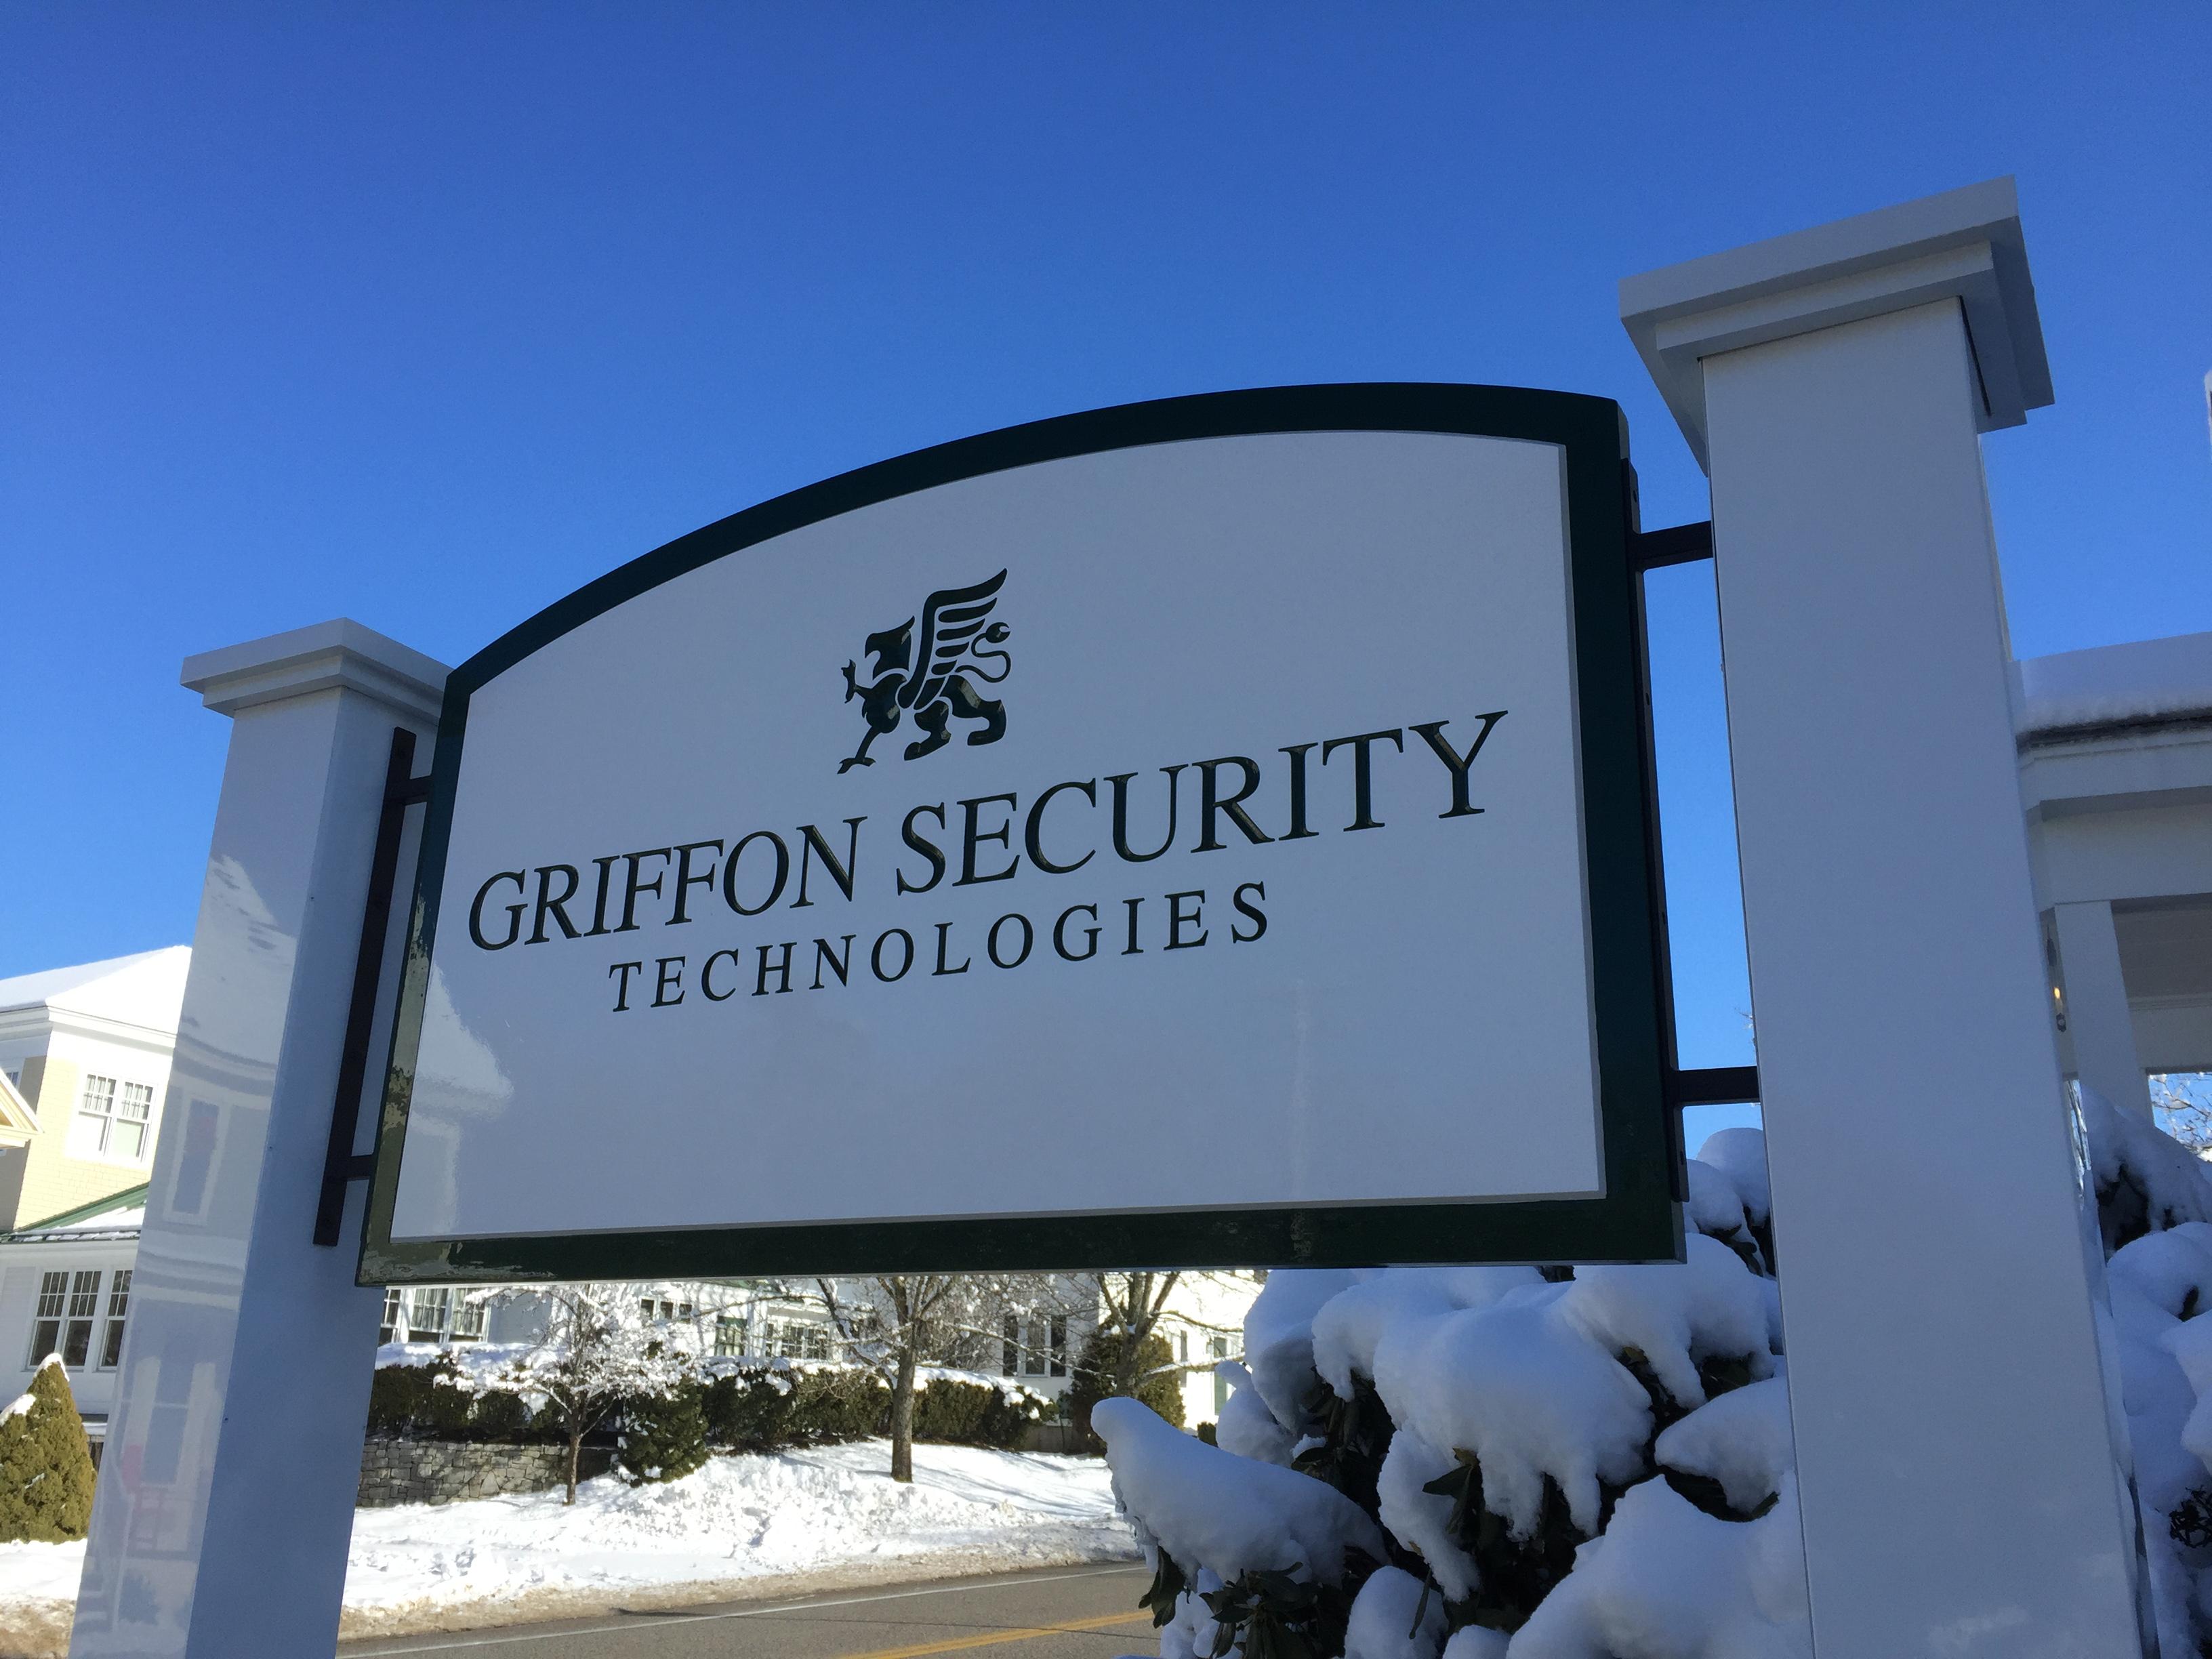 Griffon Security Technologies